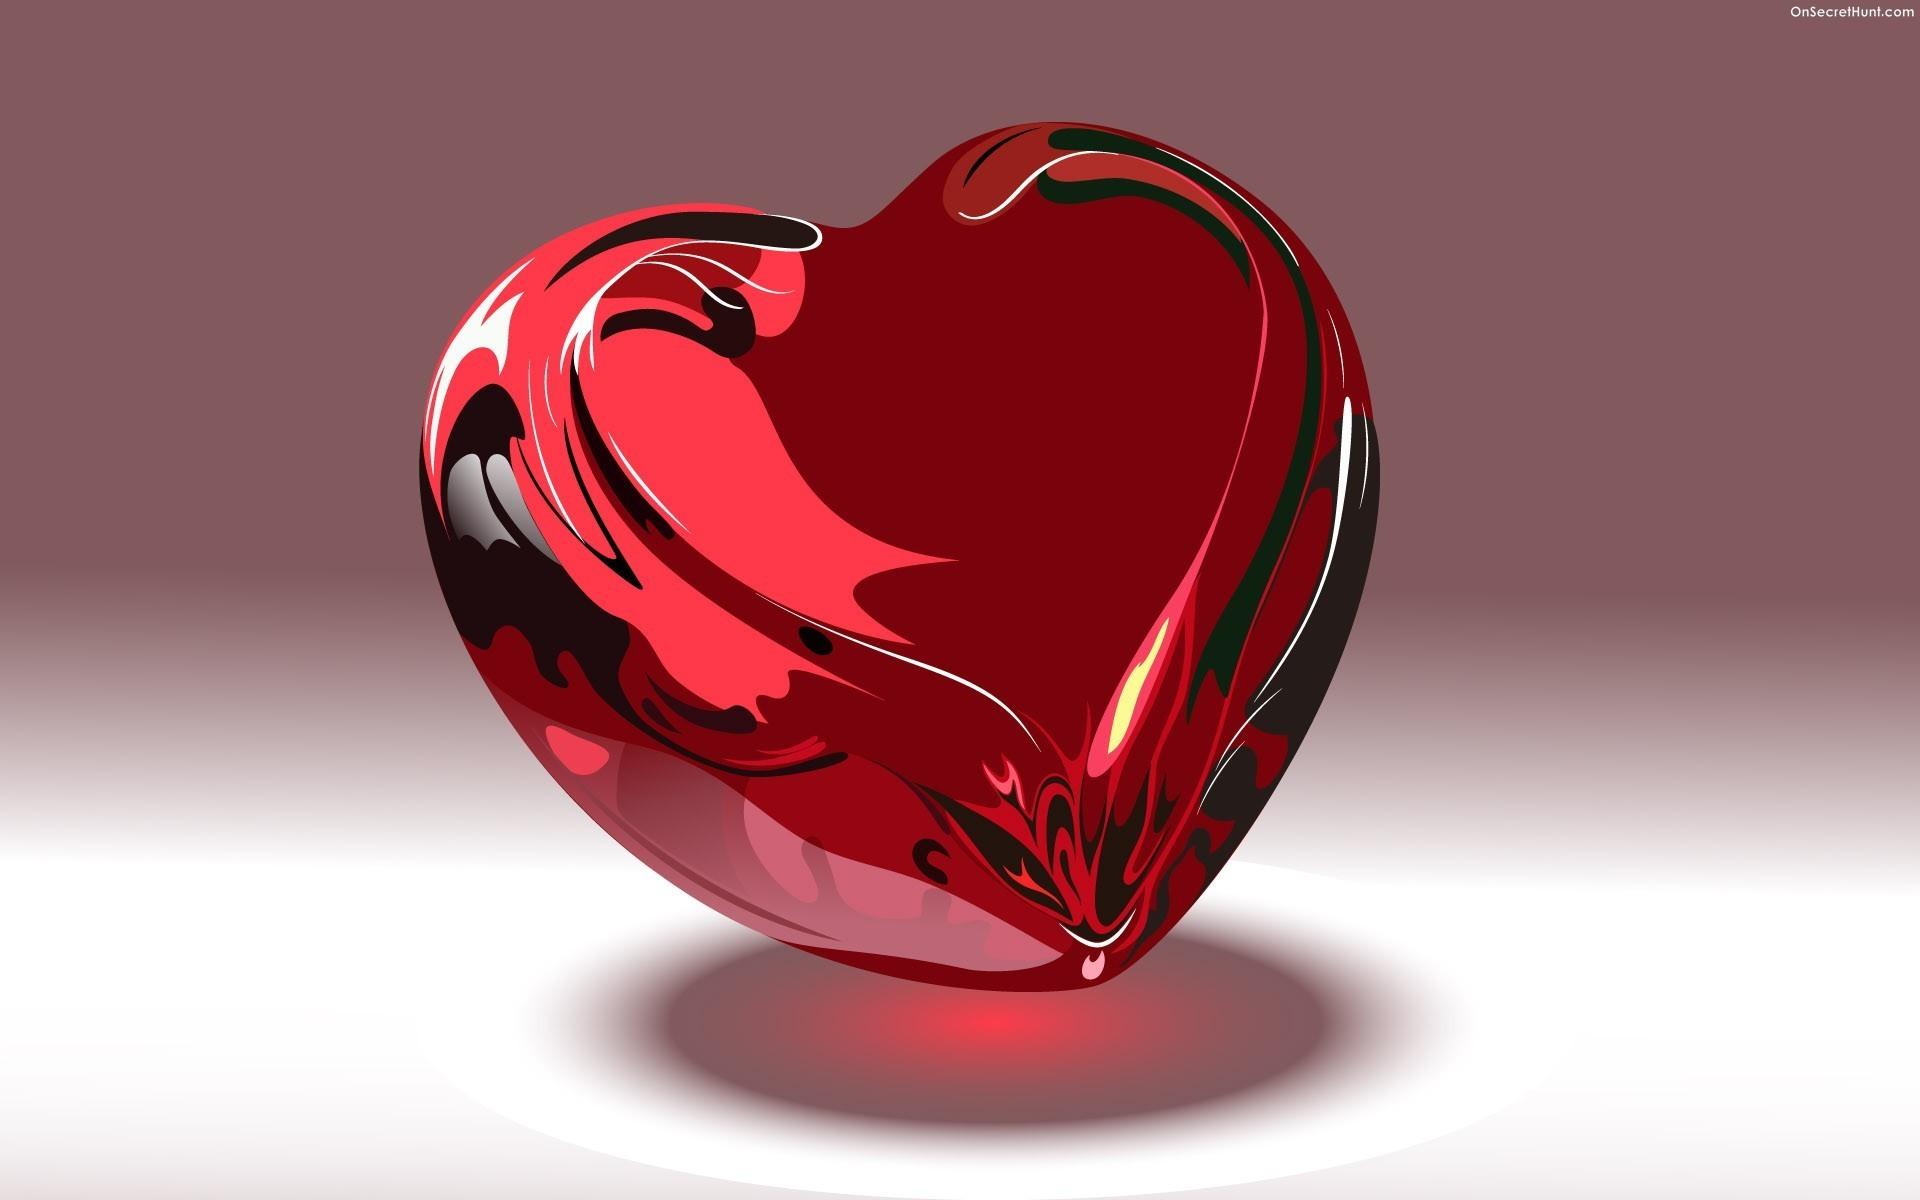 3D Love Heart 10 Free Wallpaper